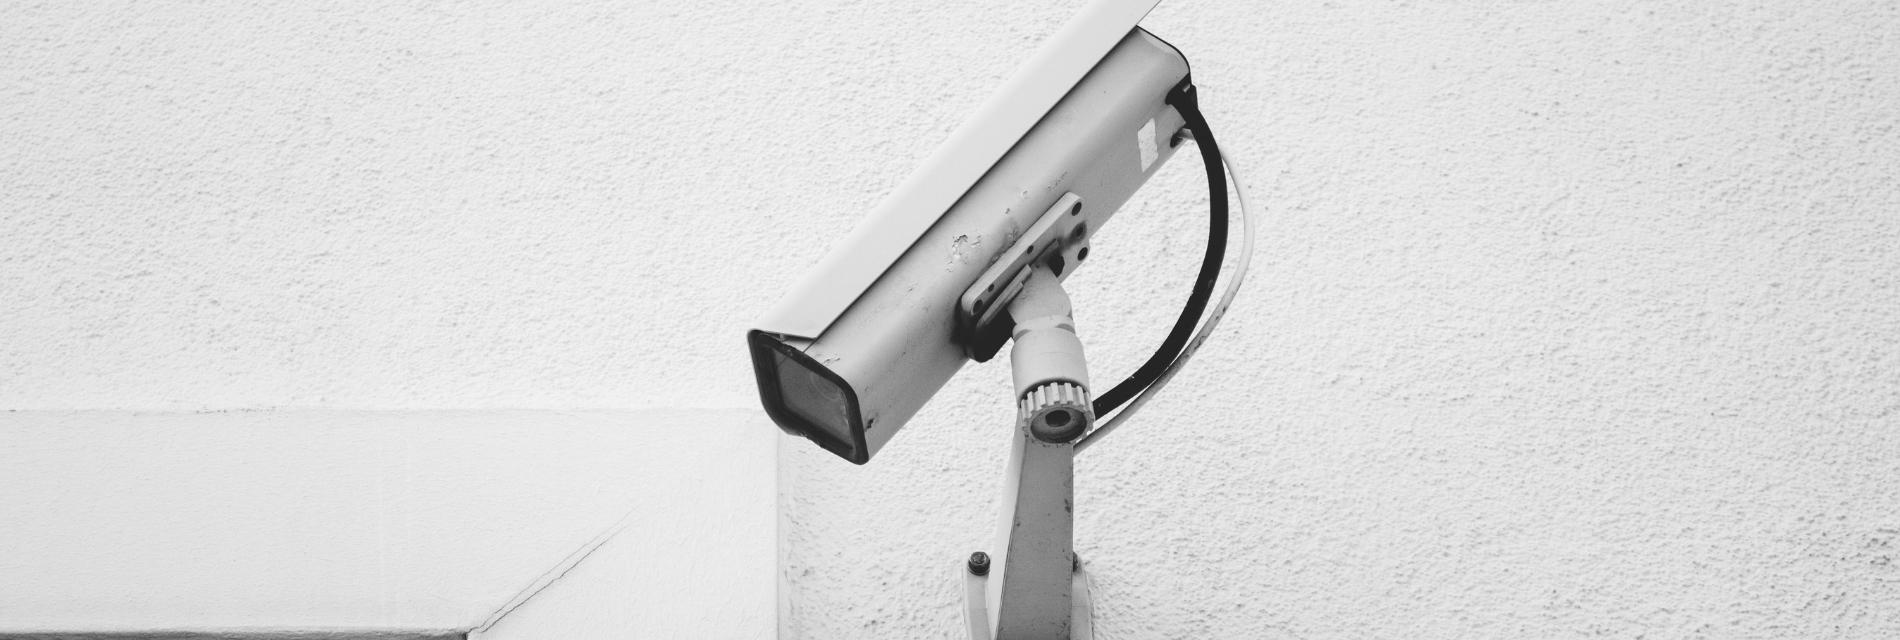 church security